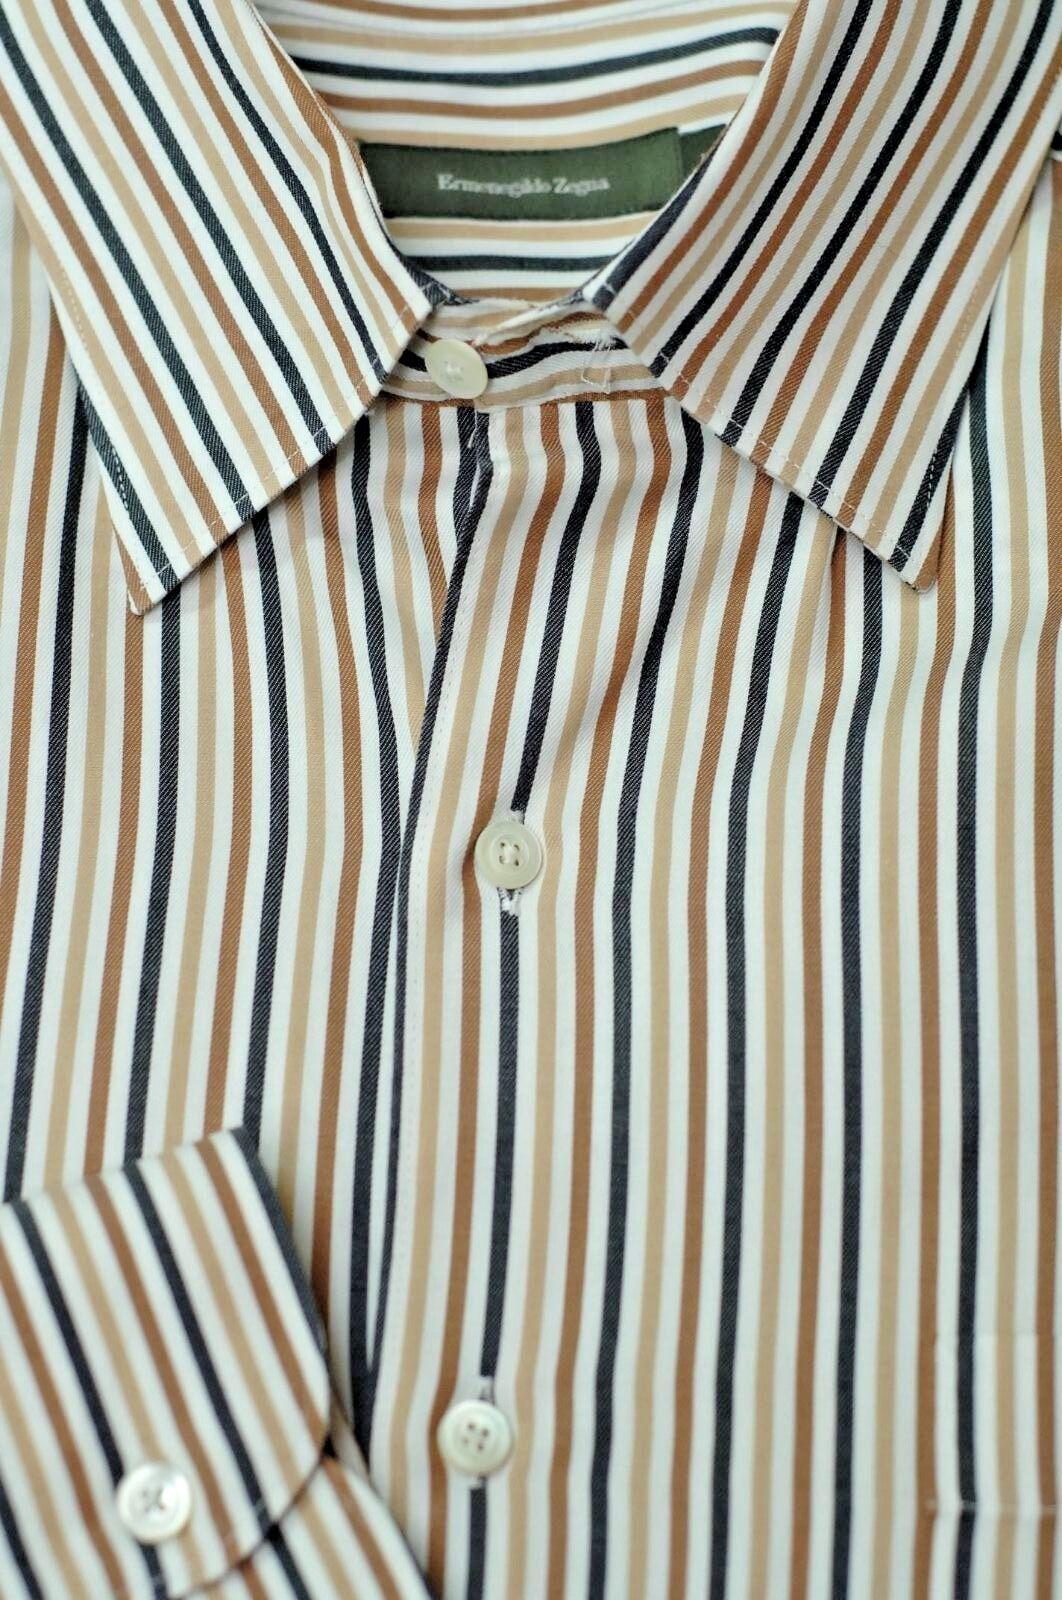 Ermenegildo Zegna Men's White Beige & Brown Stripe Cotton Casual Shirt L Large